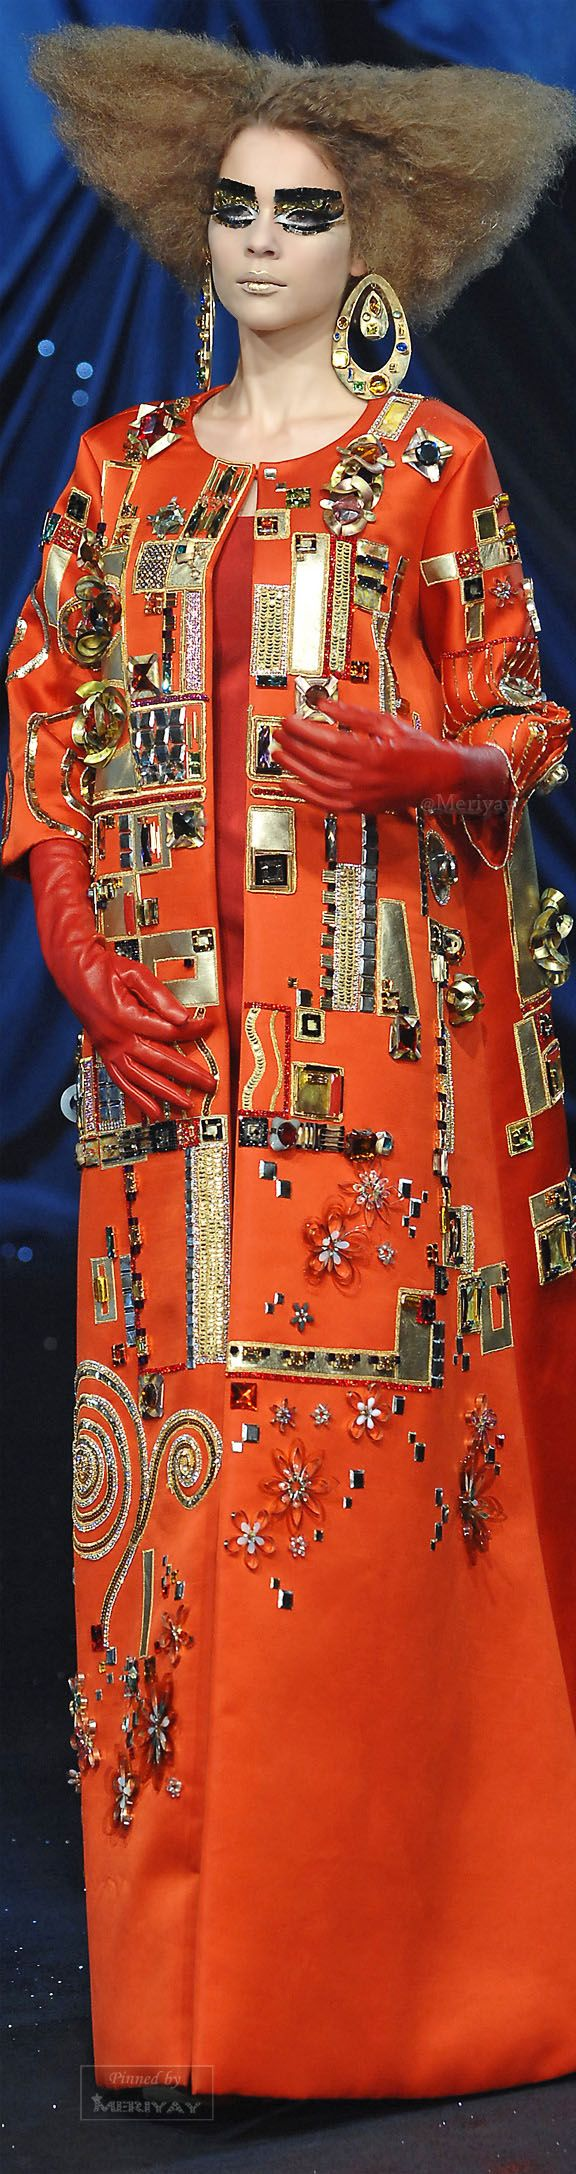 ♔Christian Dior Haute Couture Spring 2008 desisgned by John Galliano, inspired by Austrian painter Gustav Klimt. Model: Kim Noorda.